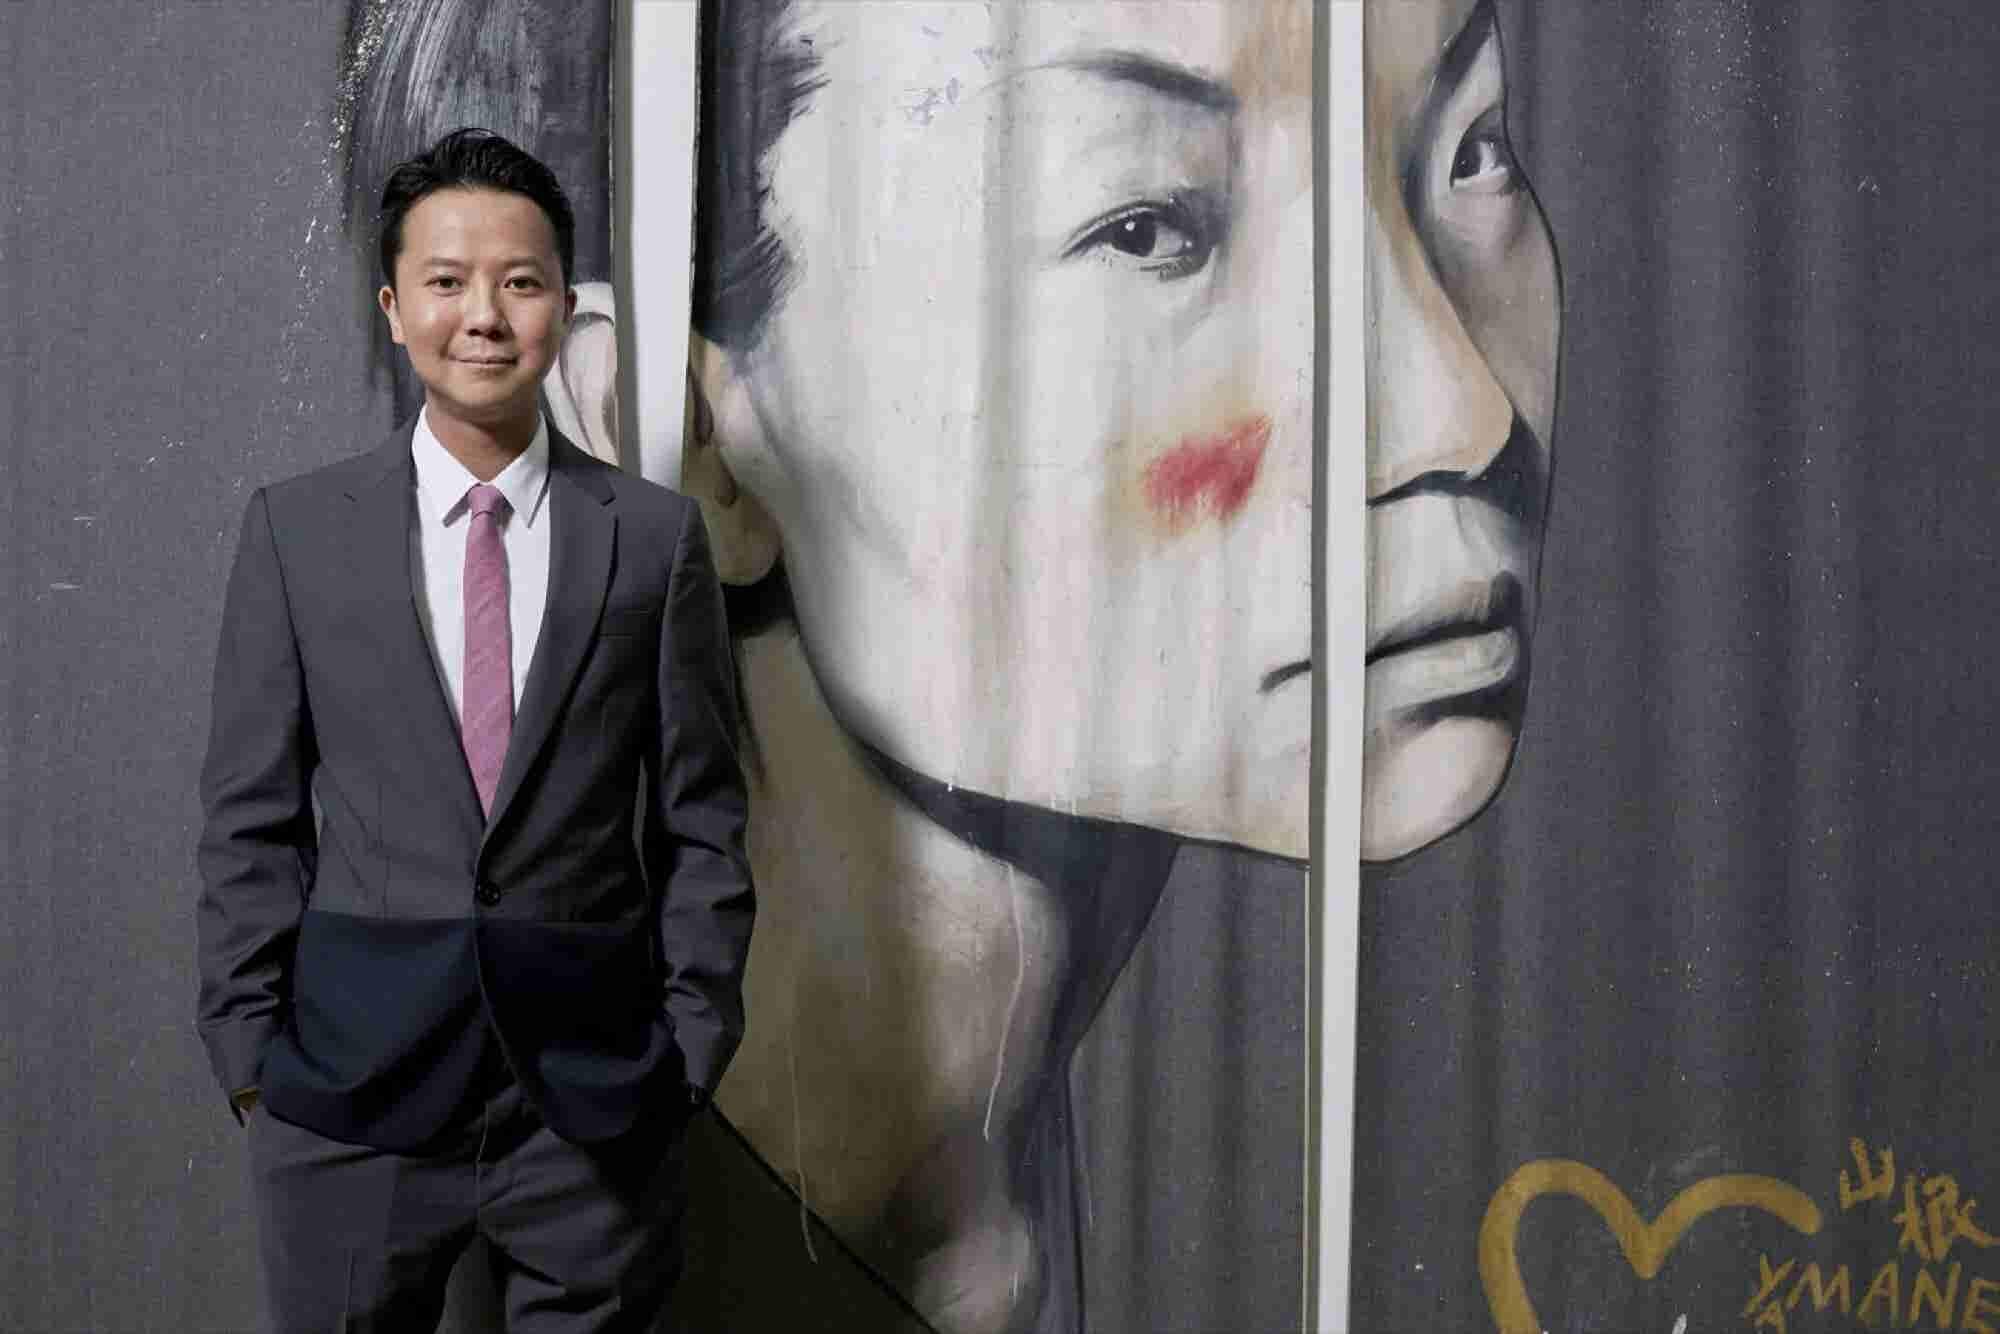 This Asian Turnaround Specialist Spun Straw Into Gold